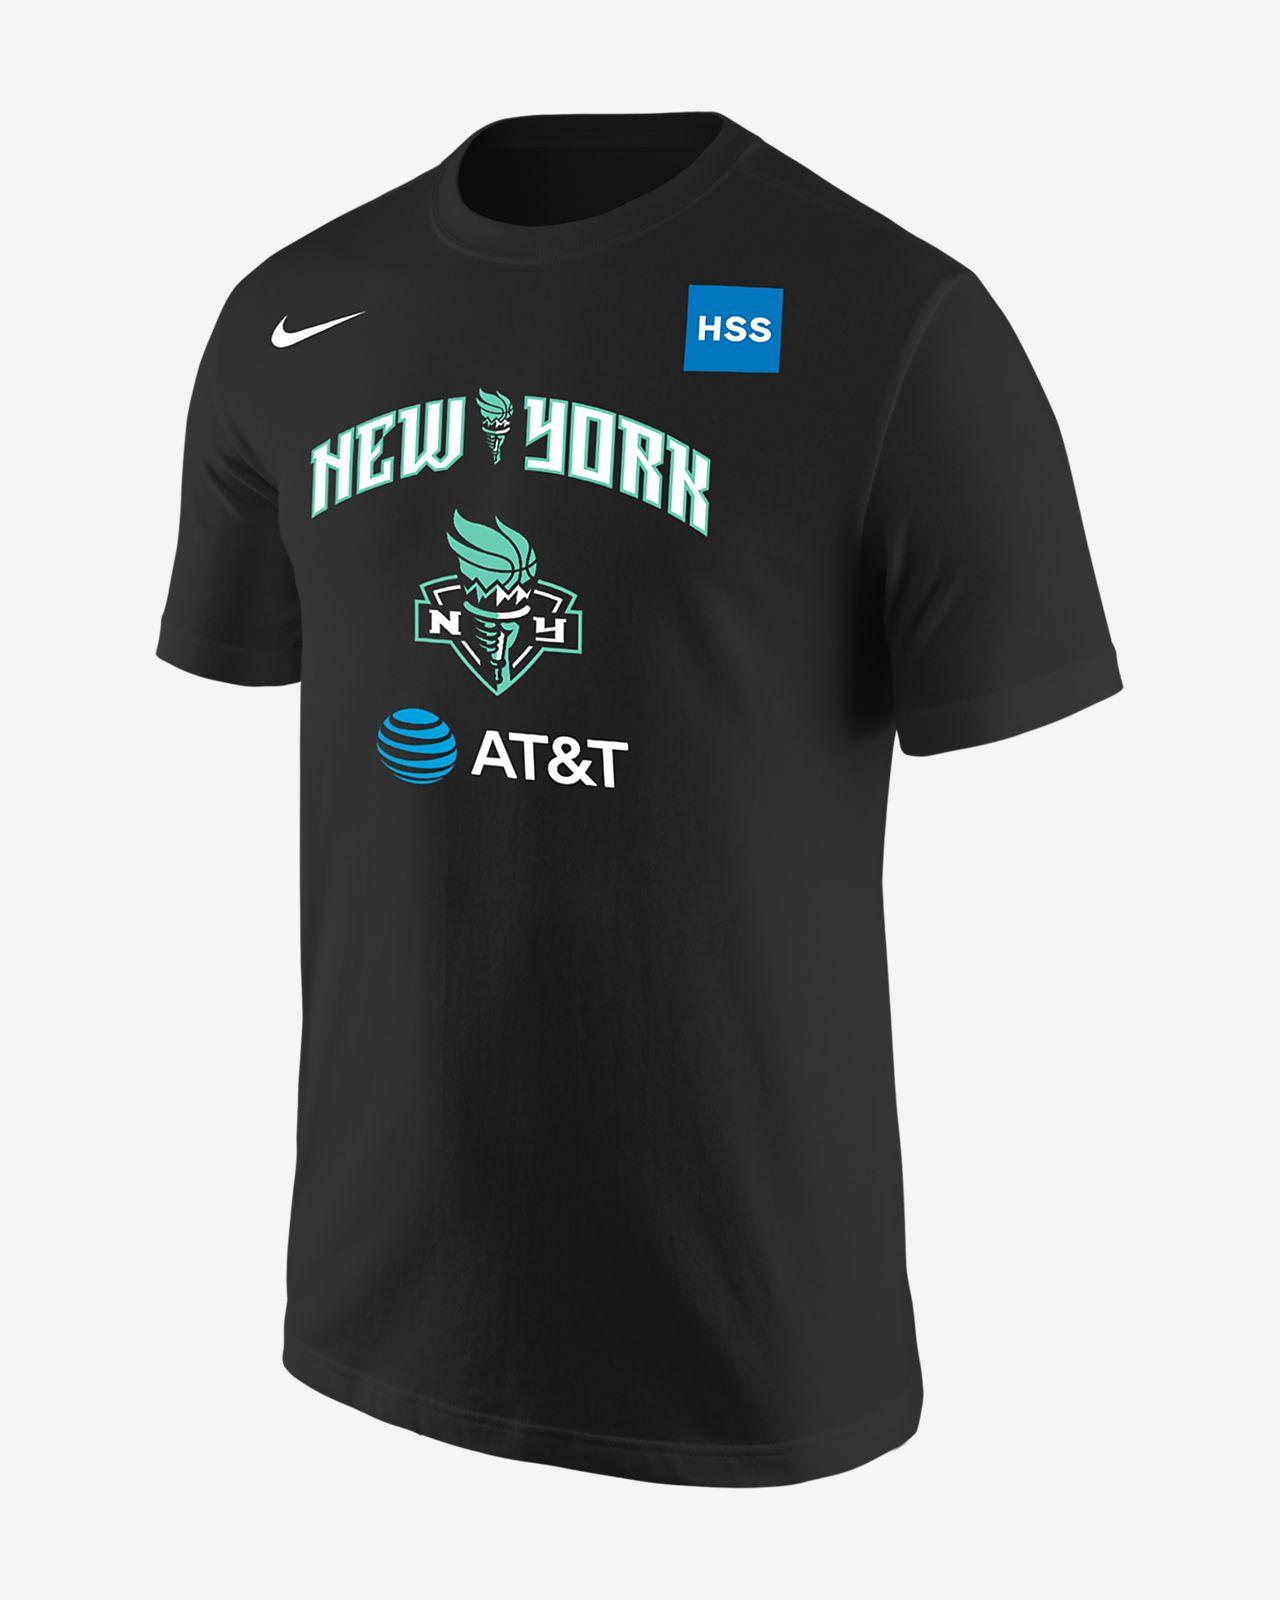 Playera de Nike WNBA para hombre Sabrina Ionescu New York Liberty